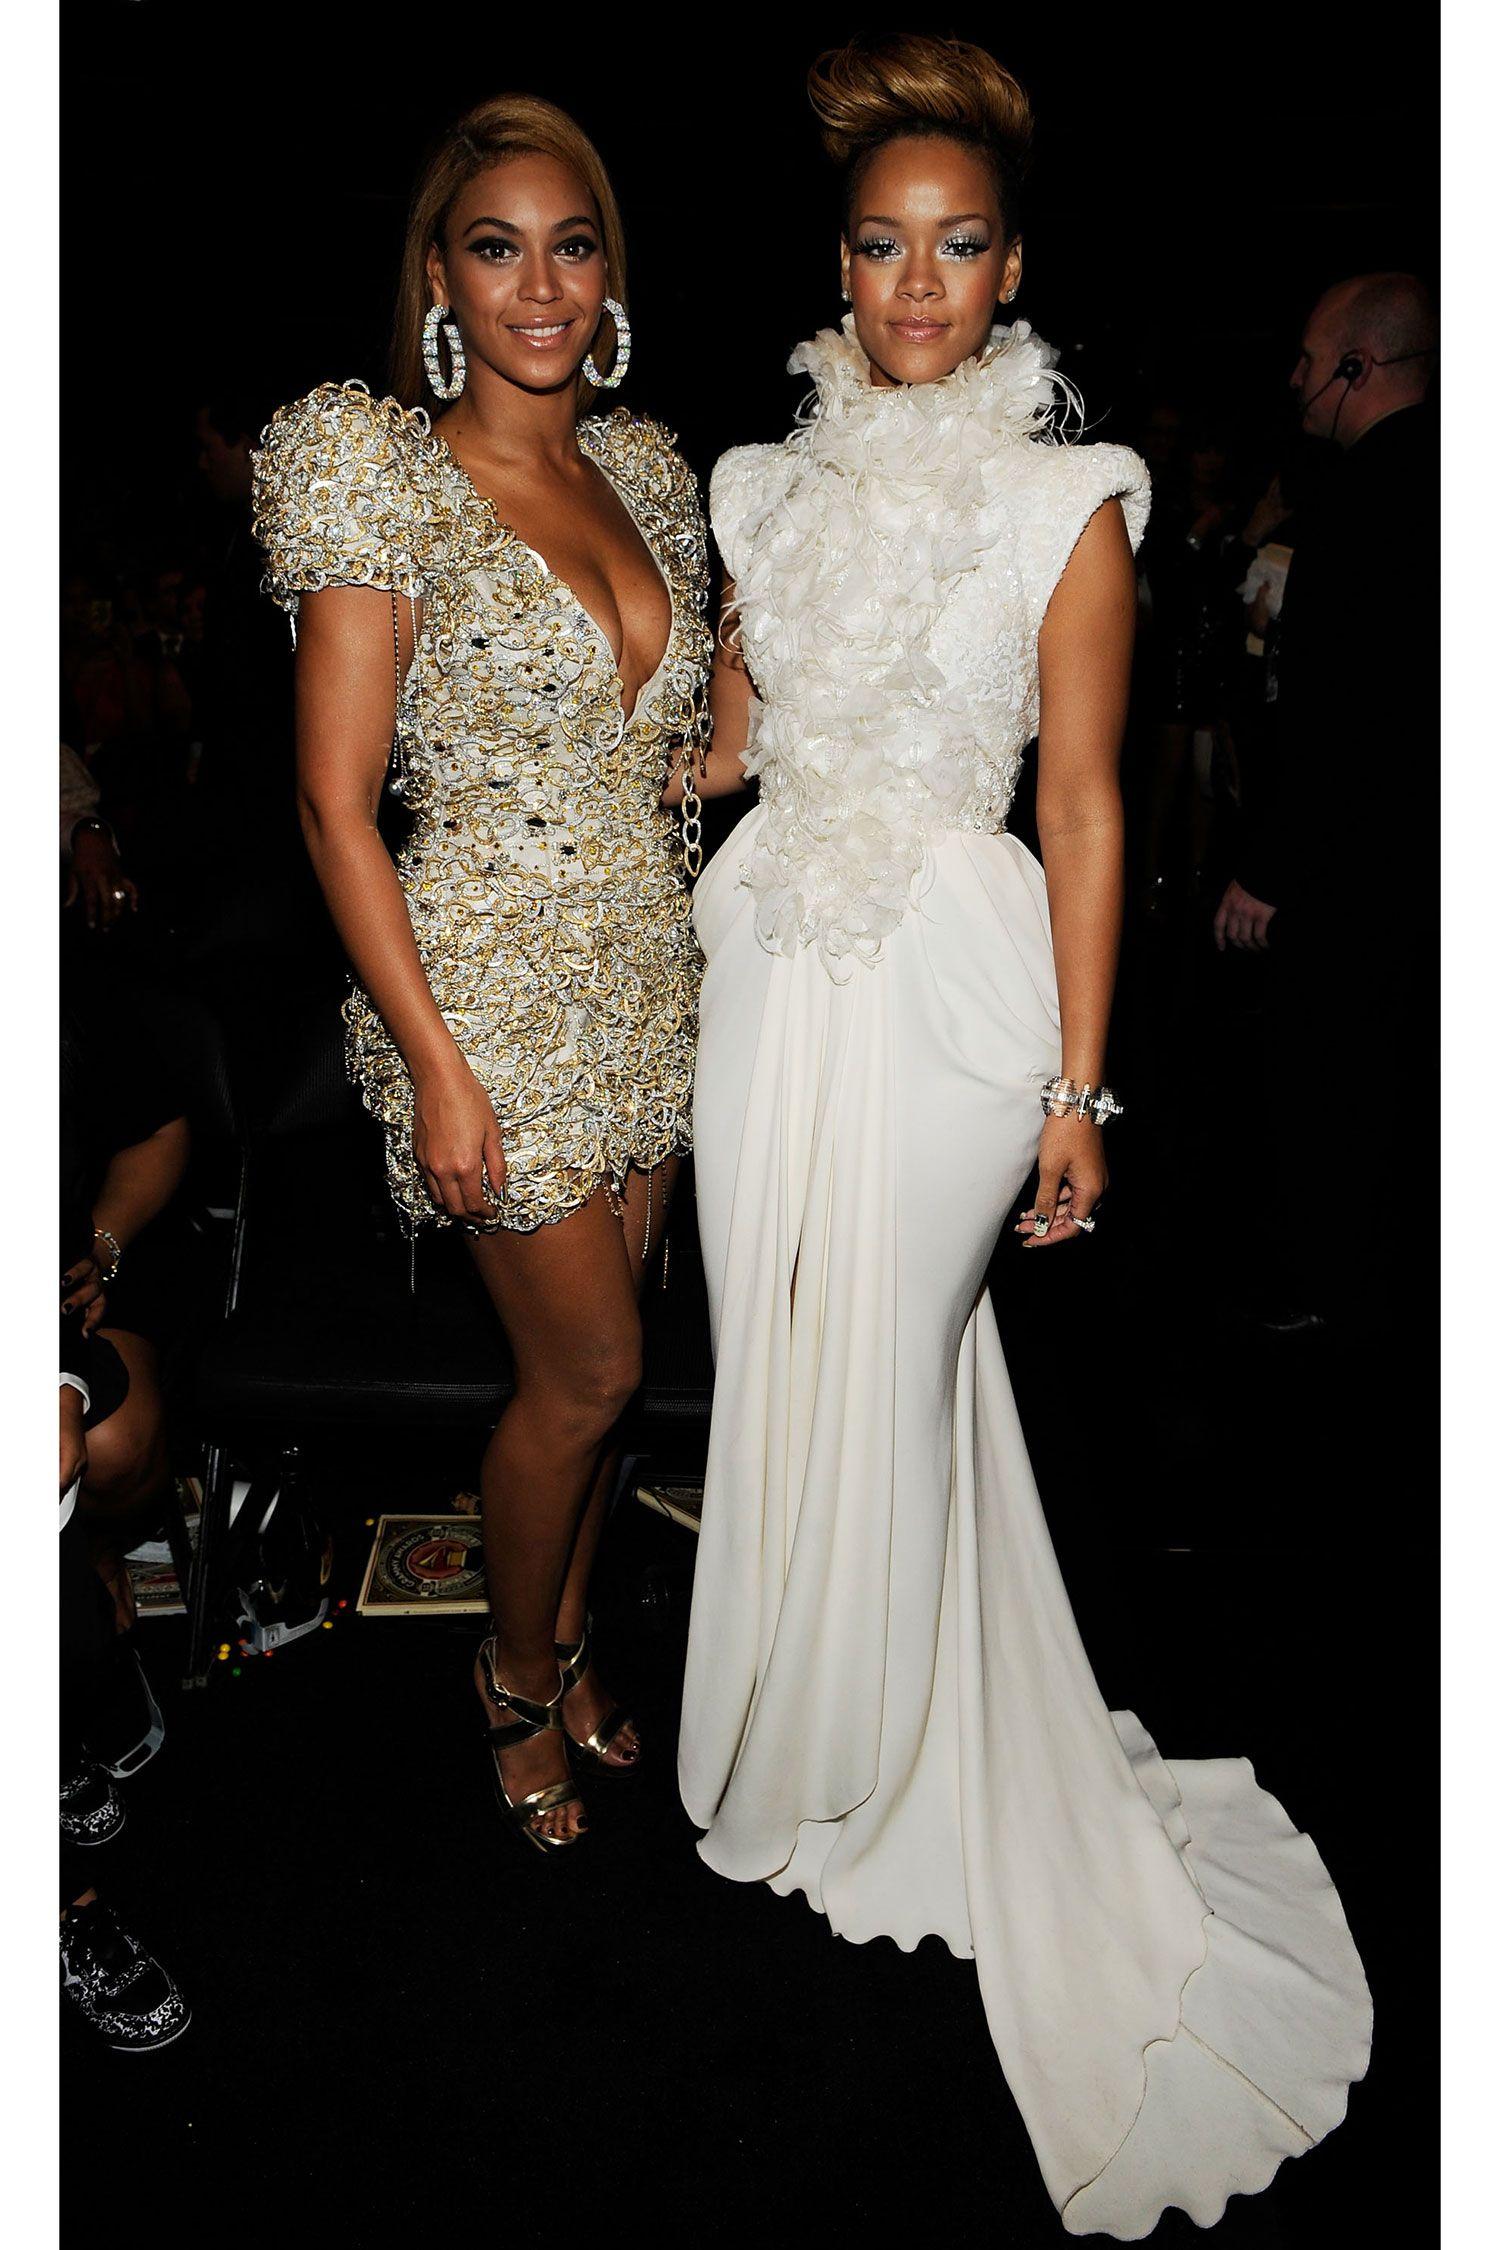 Are Beyoncé and Rihanna Teaming Up?